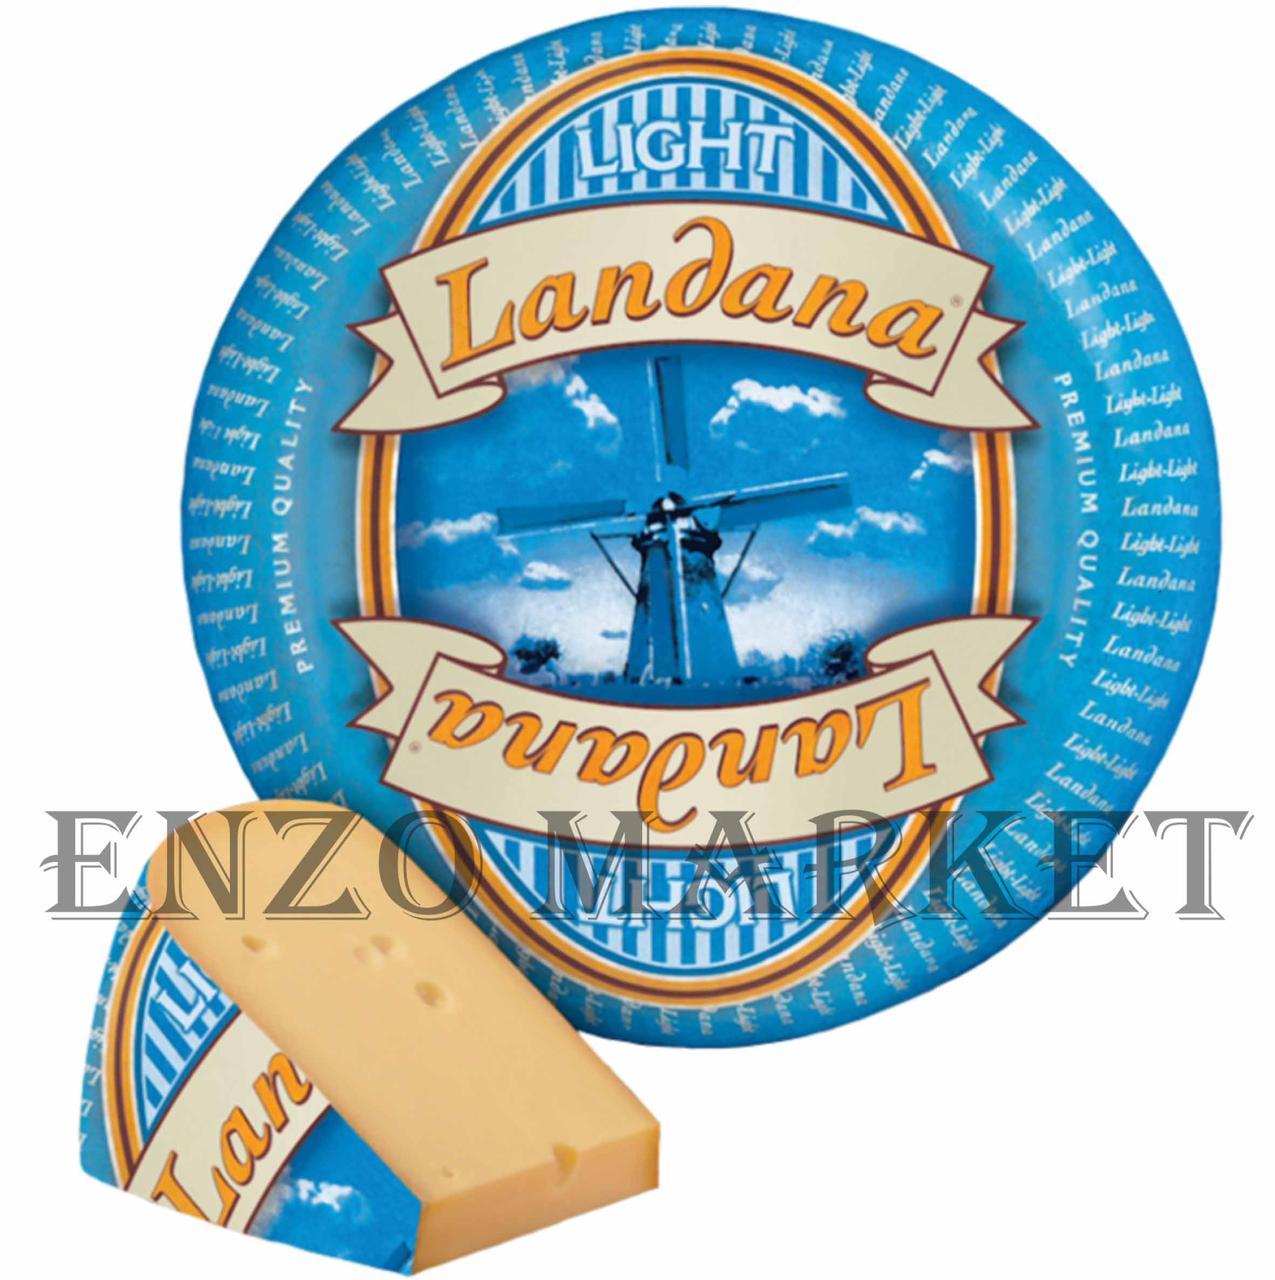 Сыр Landana Light 35%, 1 кг